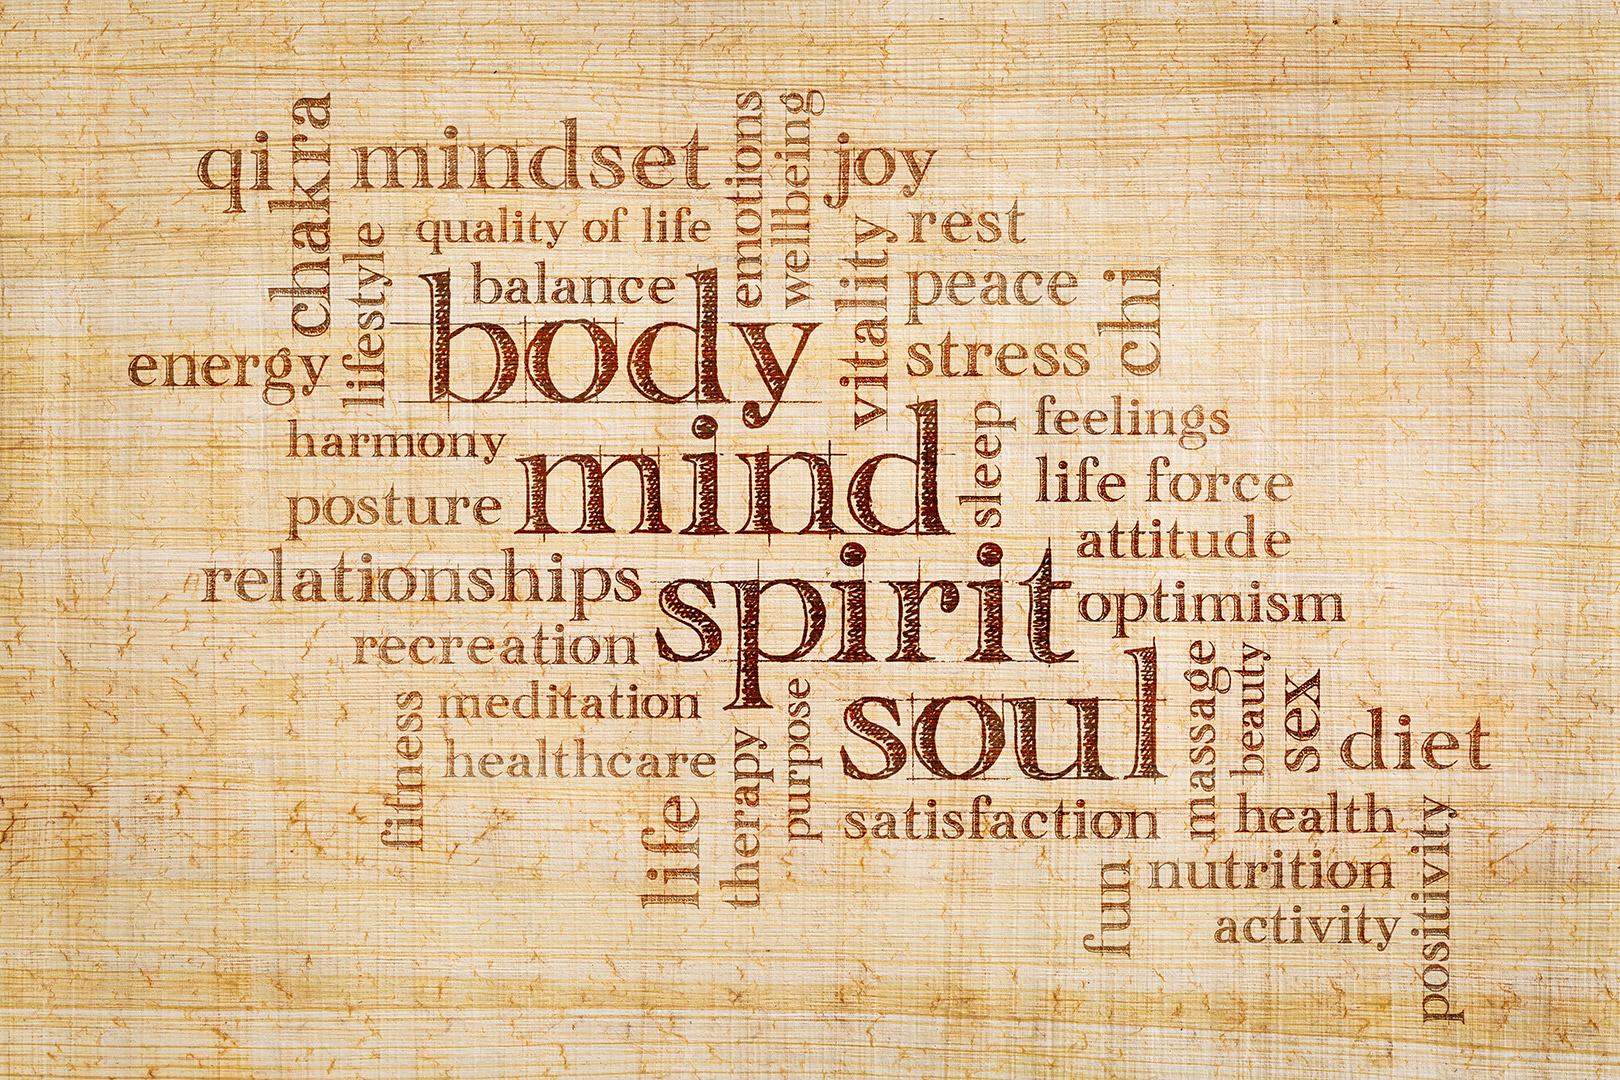 body_mind-615491342_istock_kl2